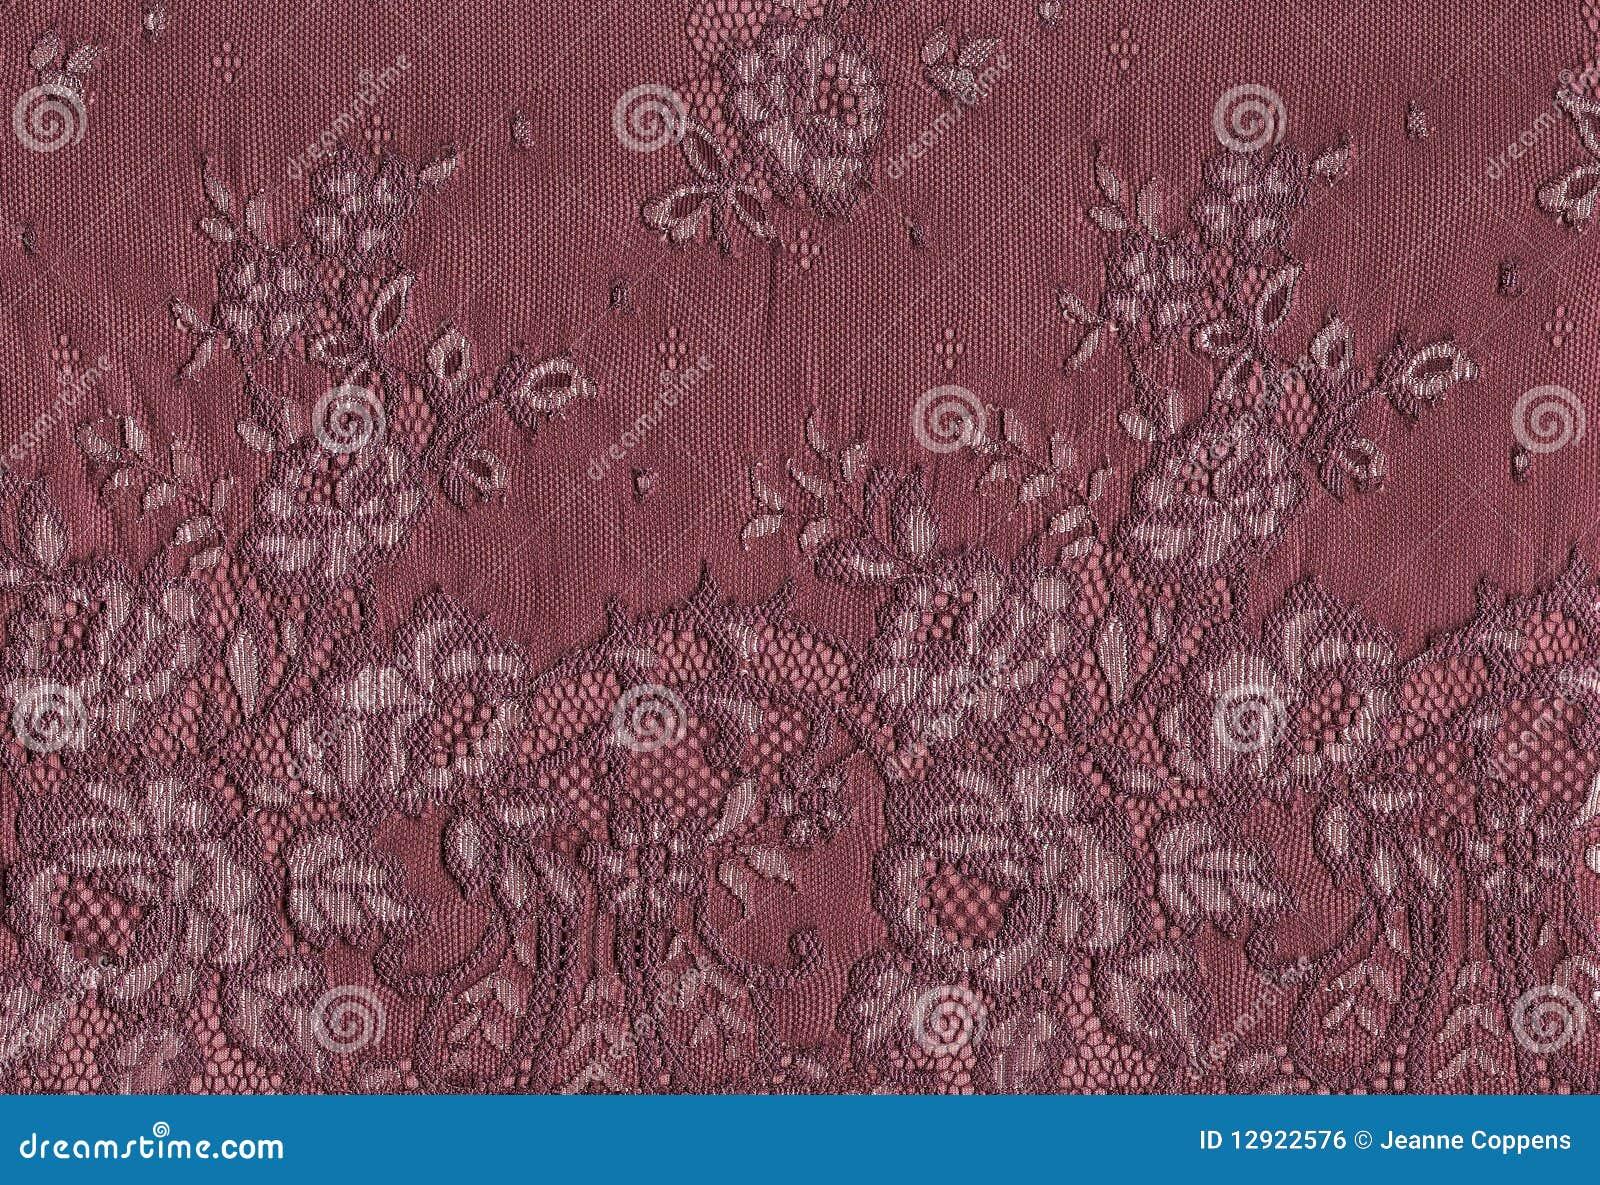 Pink lace background. stock photo. Image of background ...